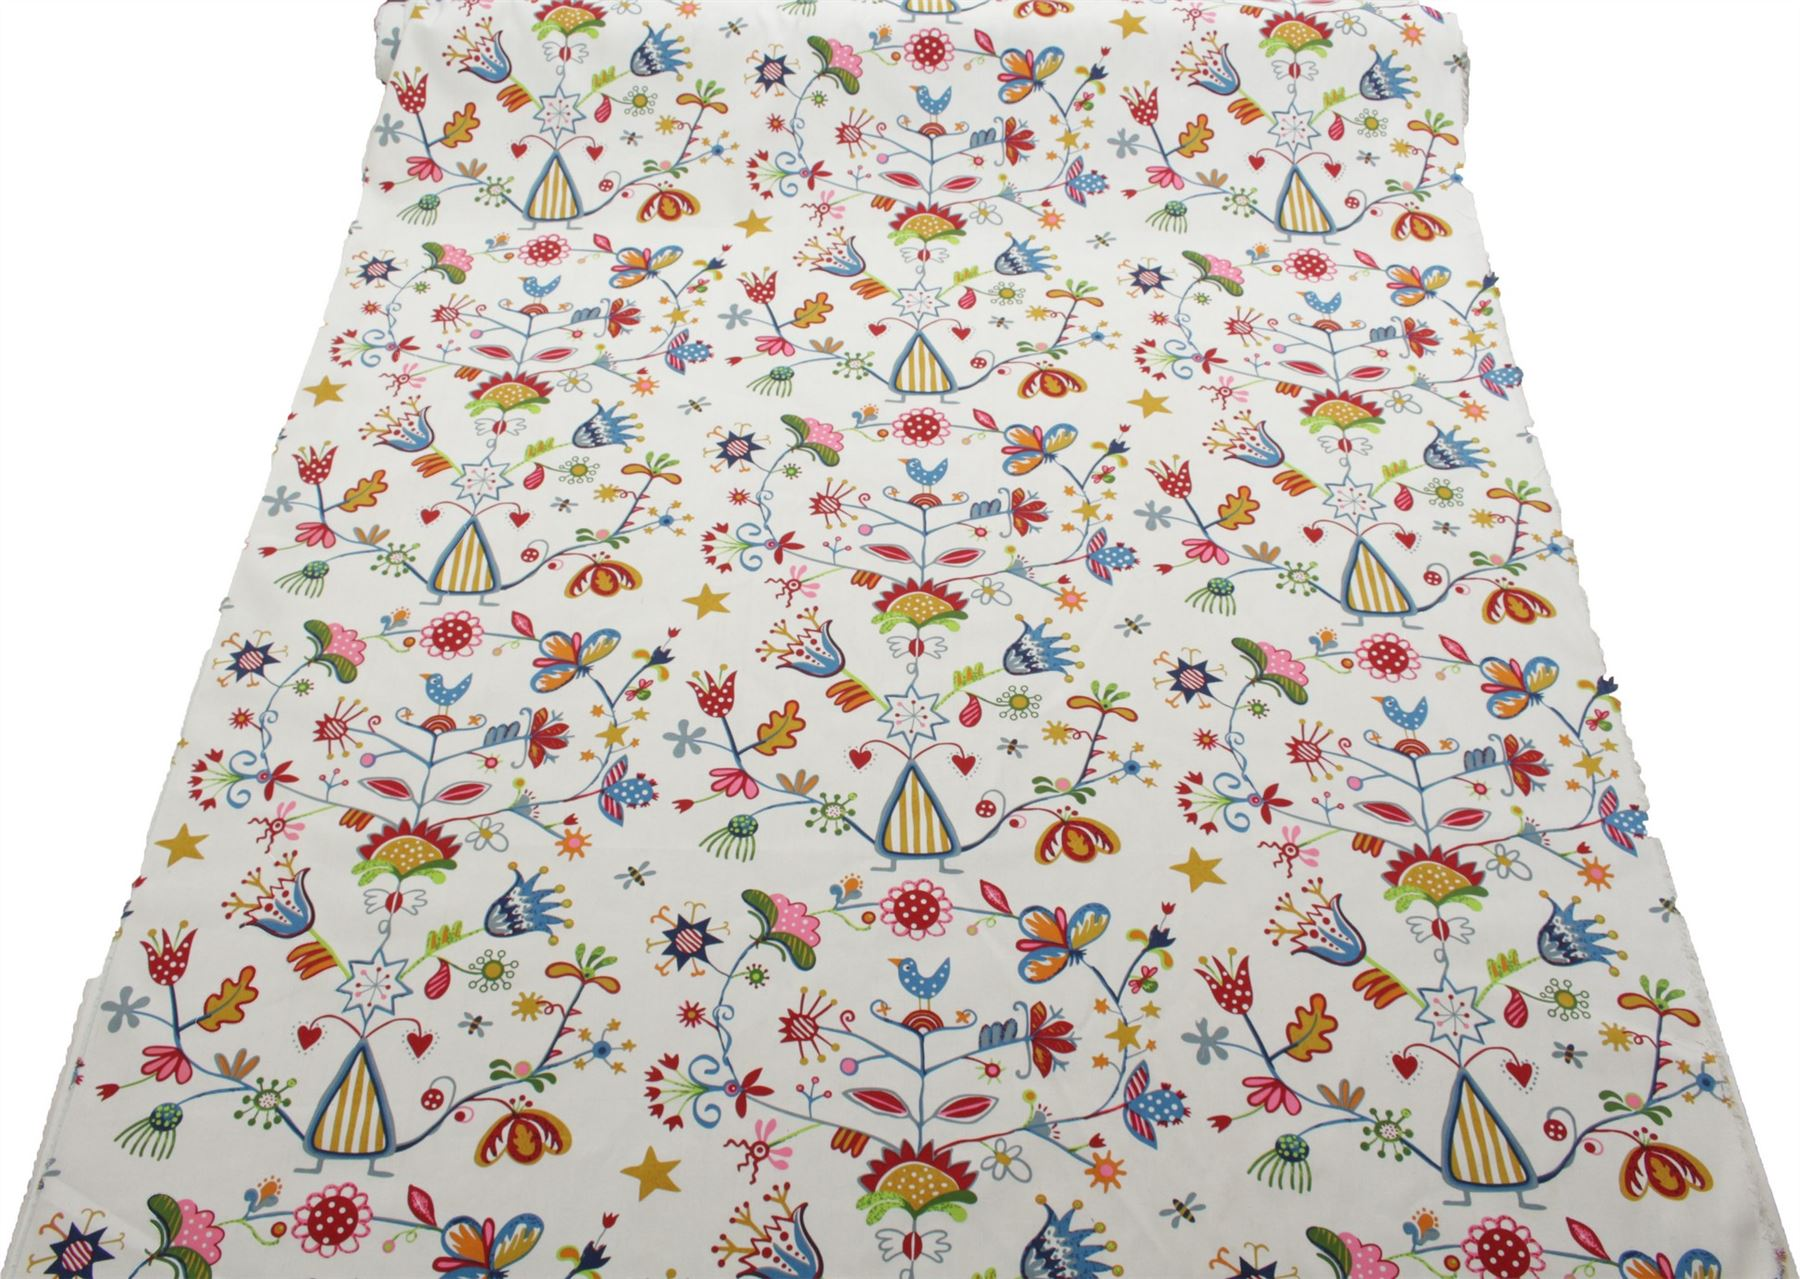 thumbnail 31 - 100% Heavy Cotton Panama Printed Childrens Curtain Cushion Upholstery Fabric